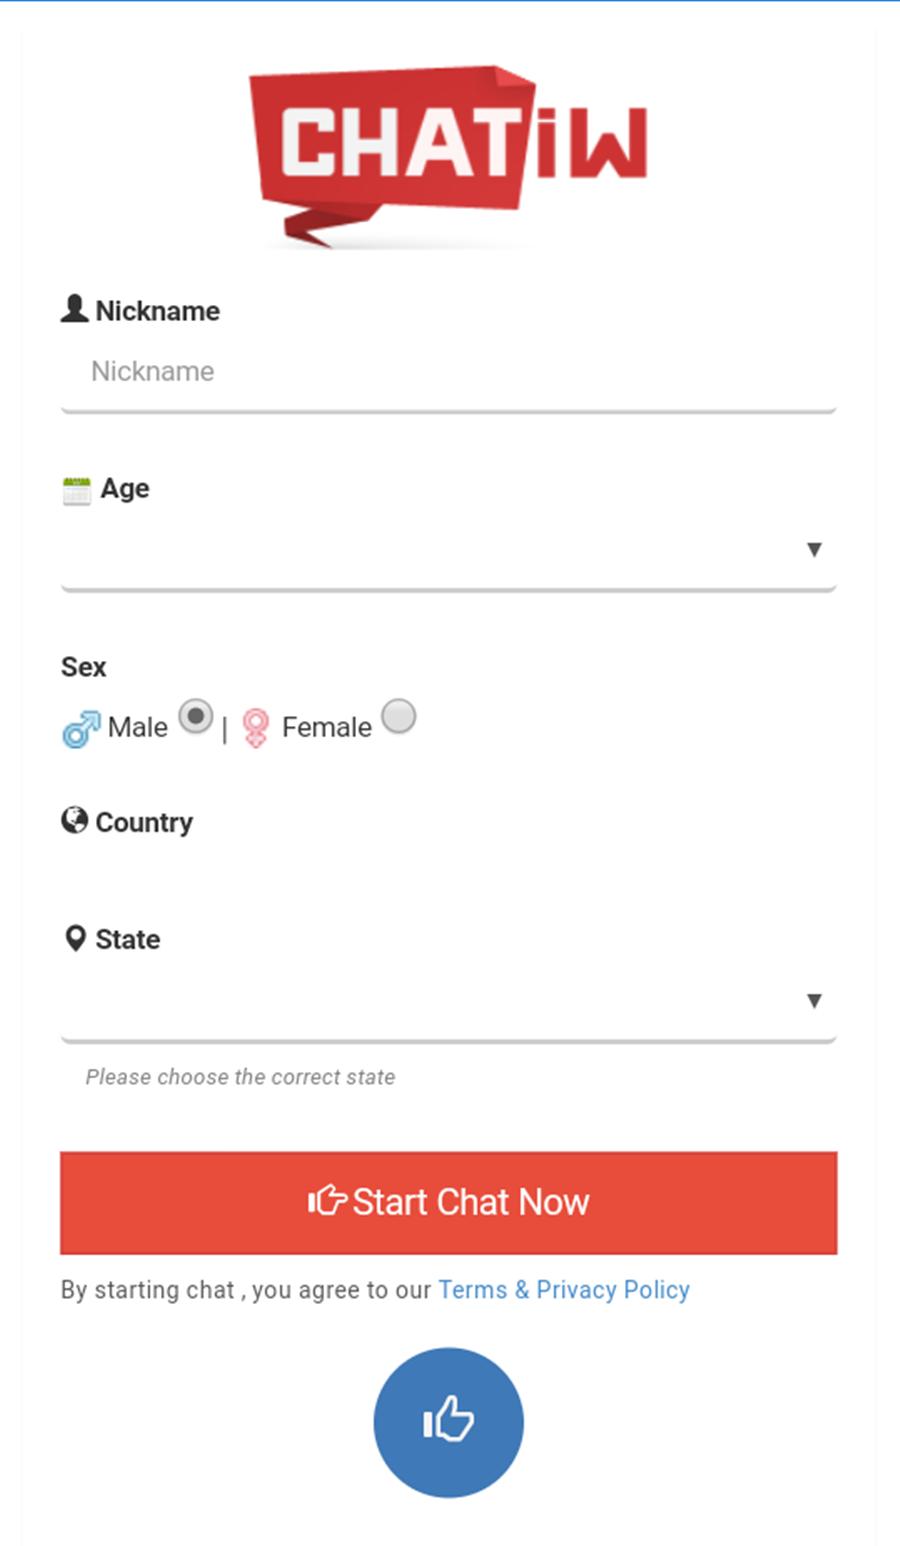 Chatiw App